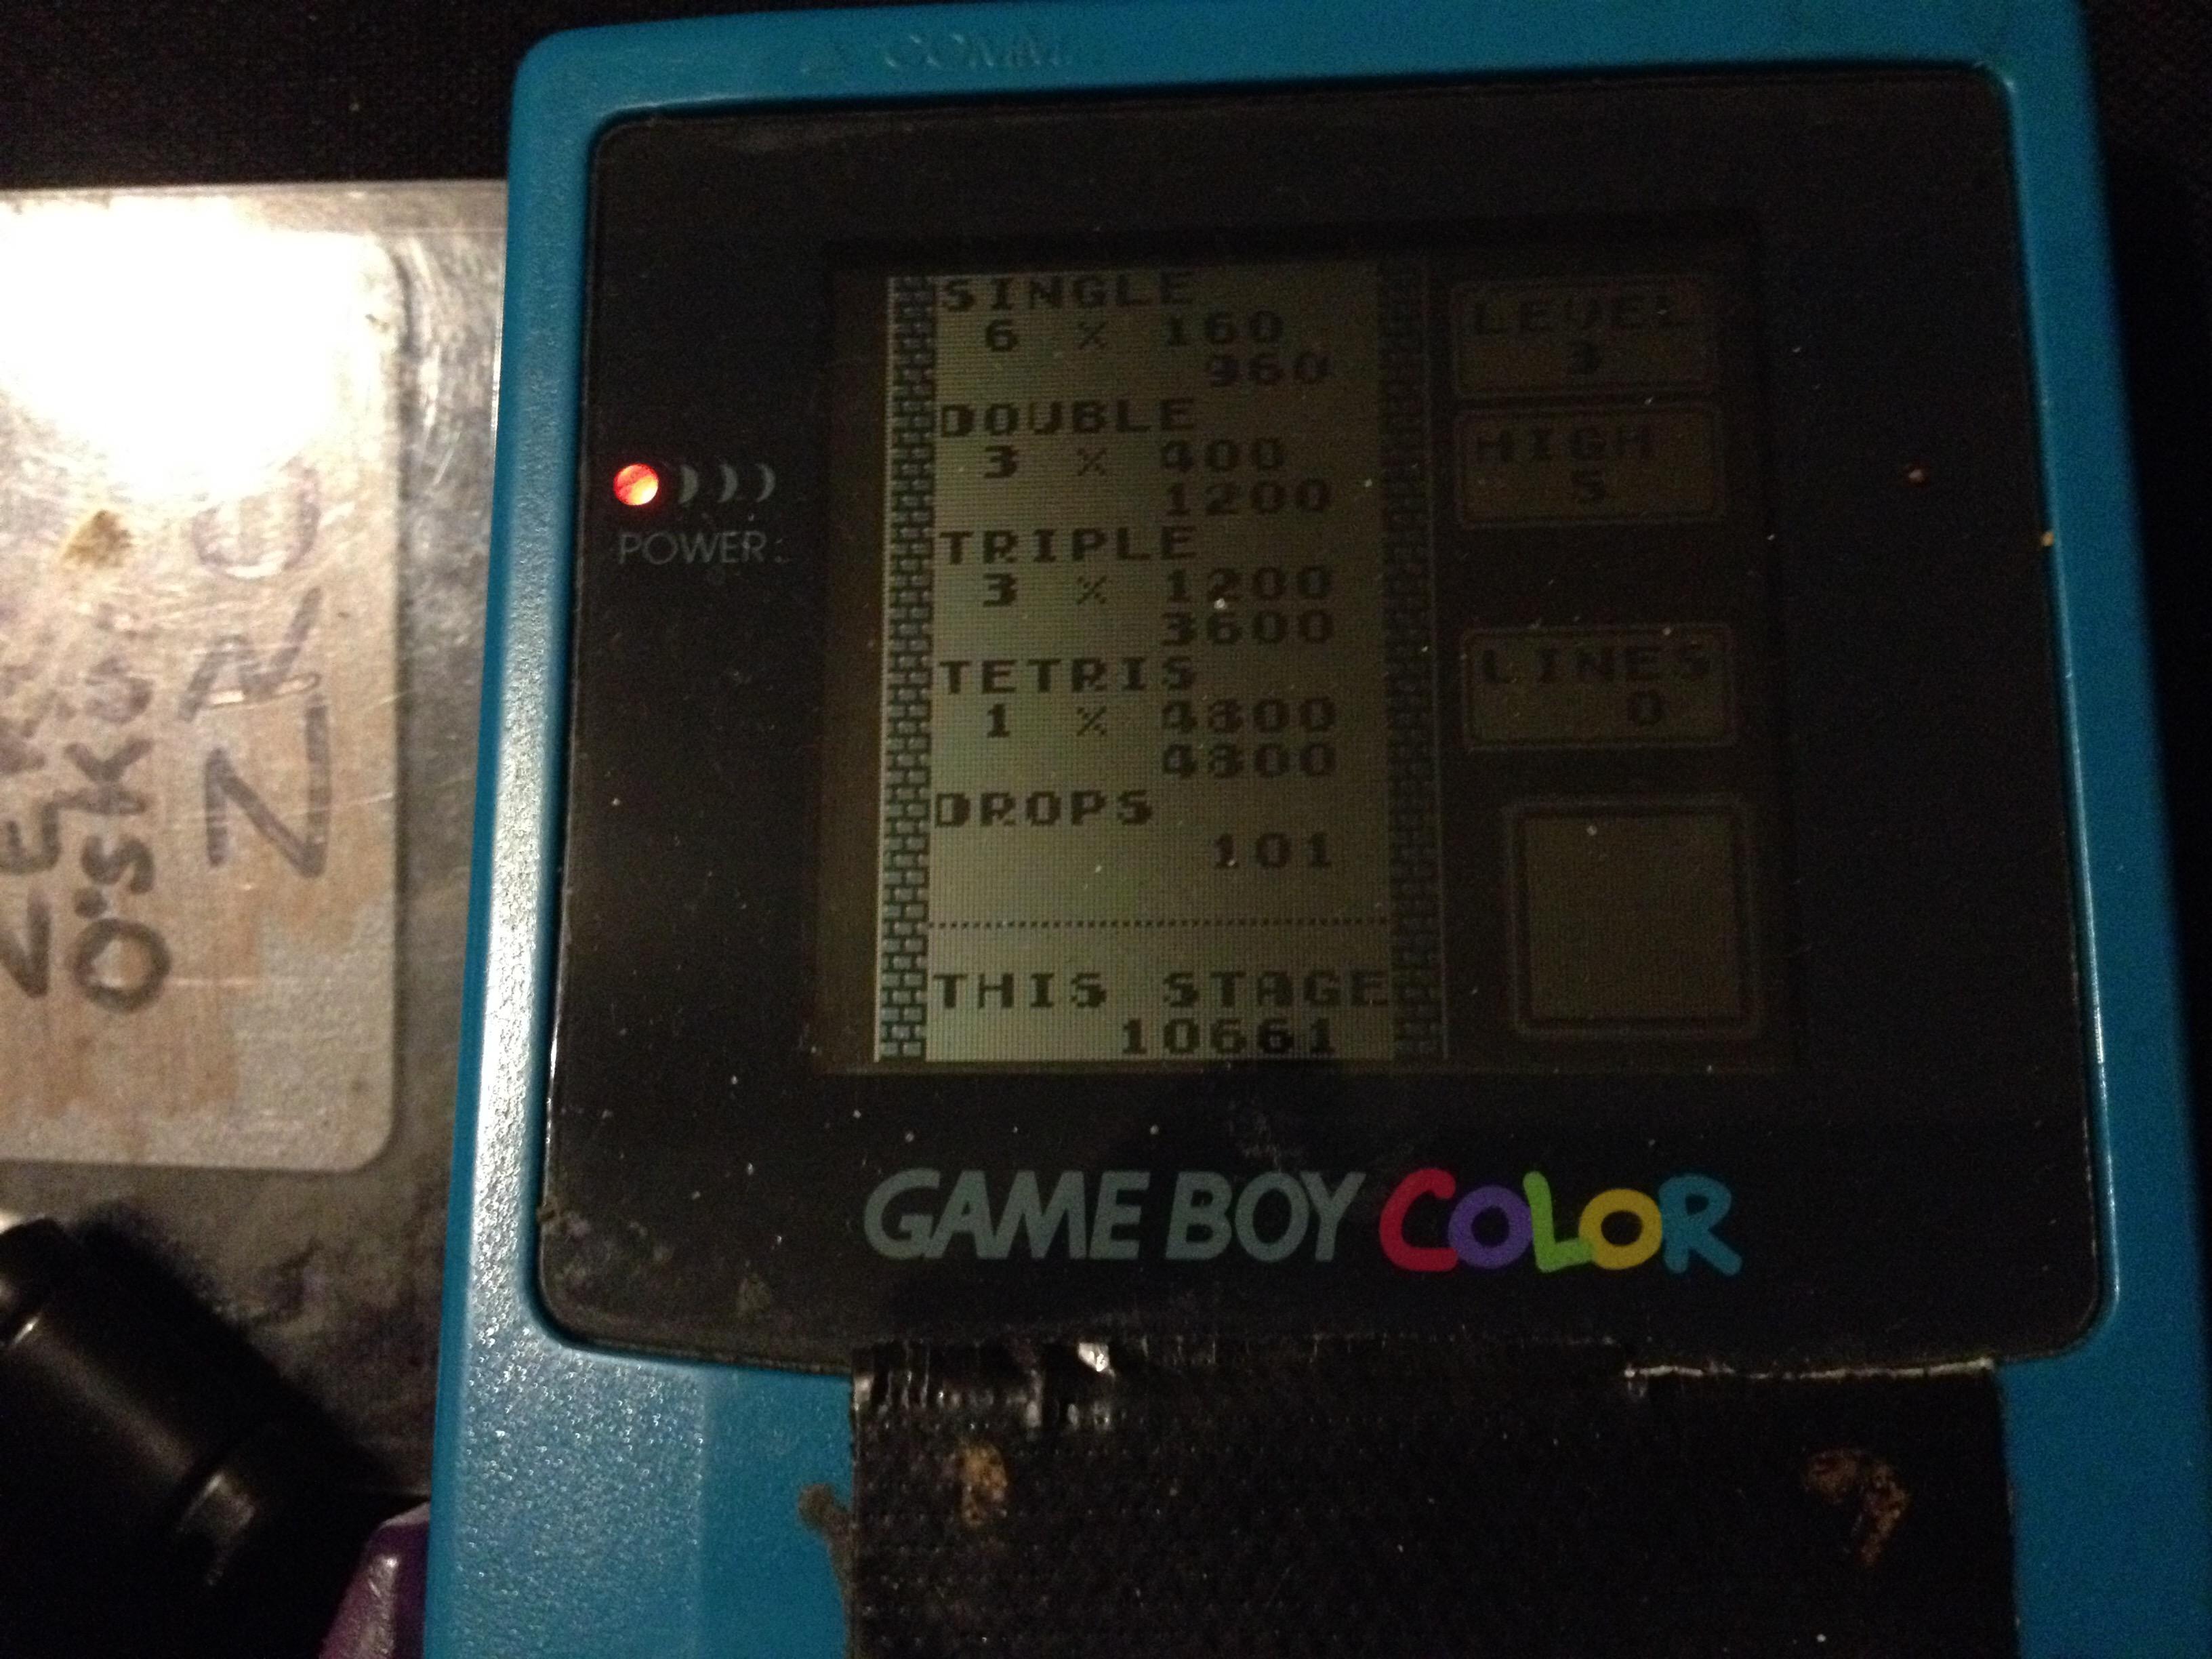 zerooskul: Tetris: Type B [Level 3 / High 5] (Game Boy) 10,661 points on 2019-12-08 21:42:43